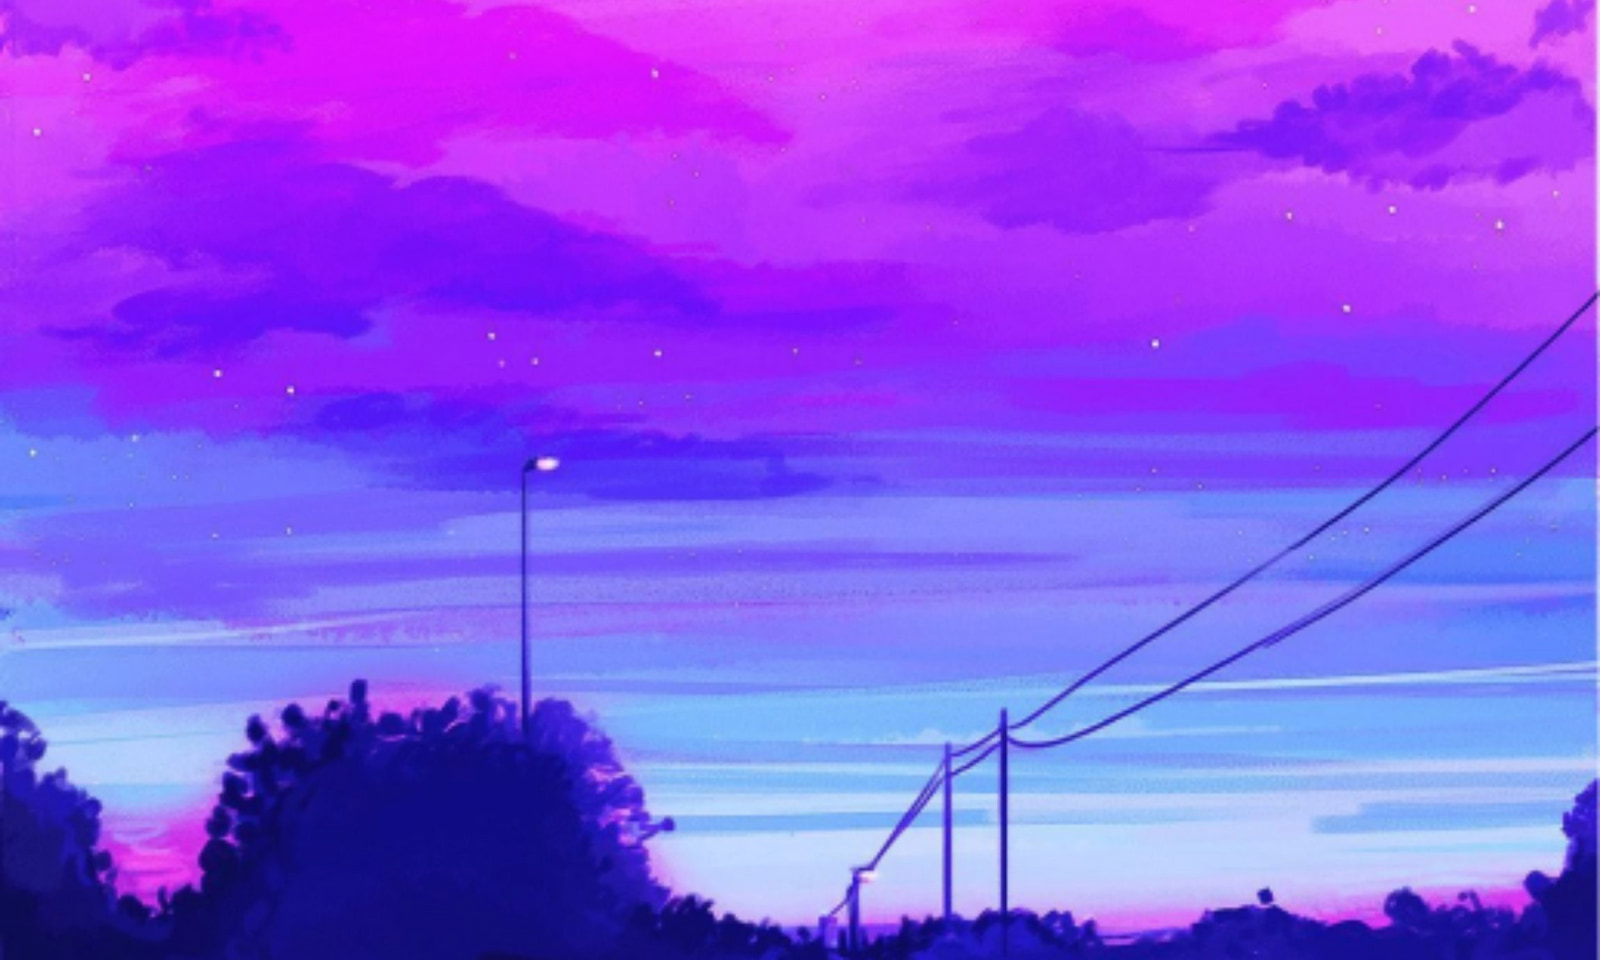 Get Lost In Star Plasma's Incredible Sky Sceneries